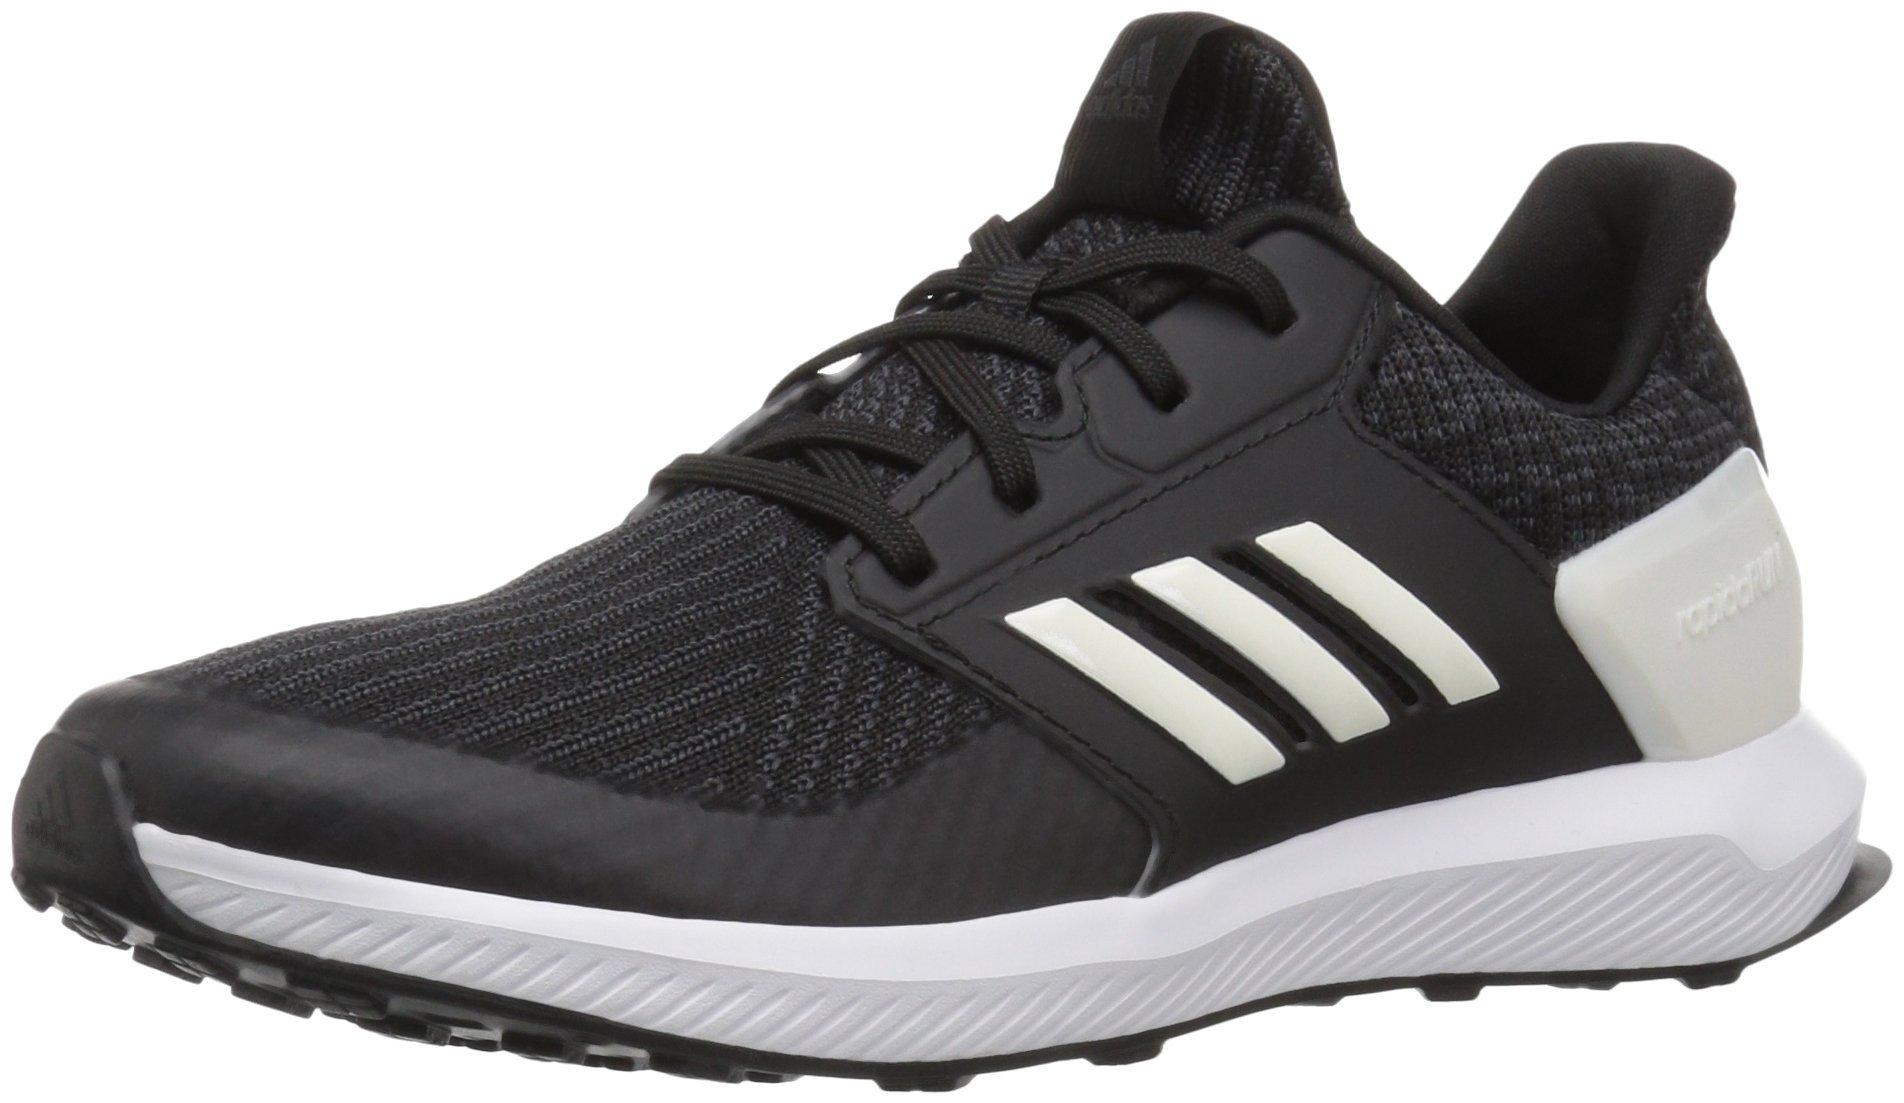 adidas Originals Unisex-Kids Rapidarun Running Shoe, Black/Cloud White/Carbon, 4 M US Big Kid